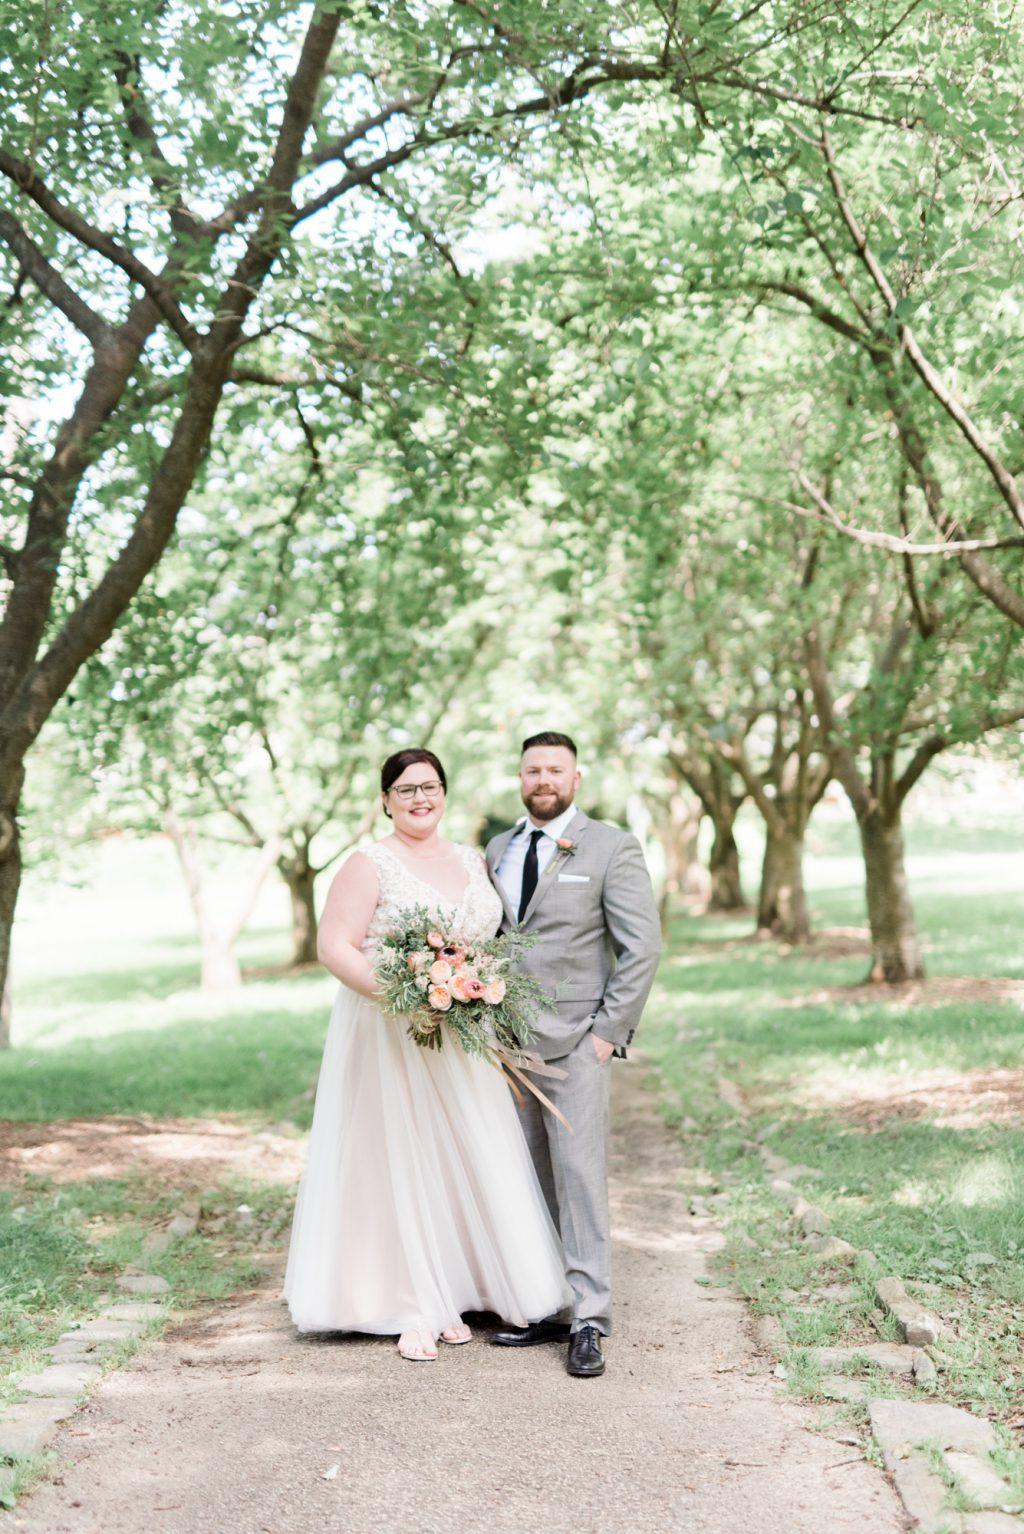 haley-richter-photo-west-chester-summer-wedding-boxcar-brewery-036